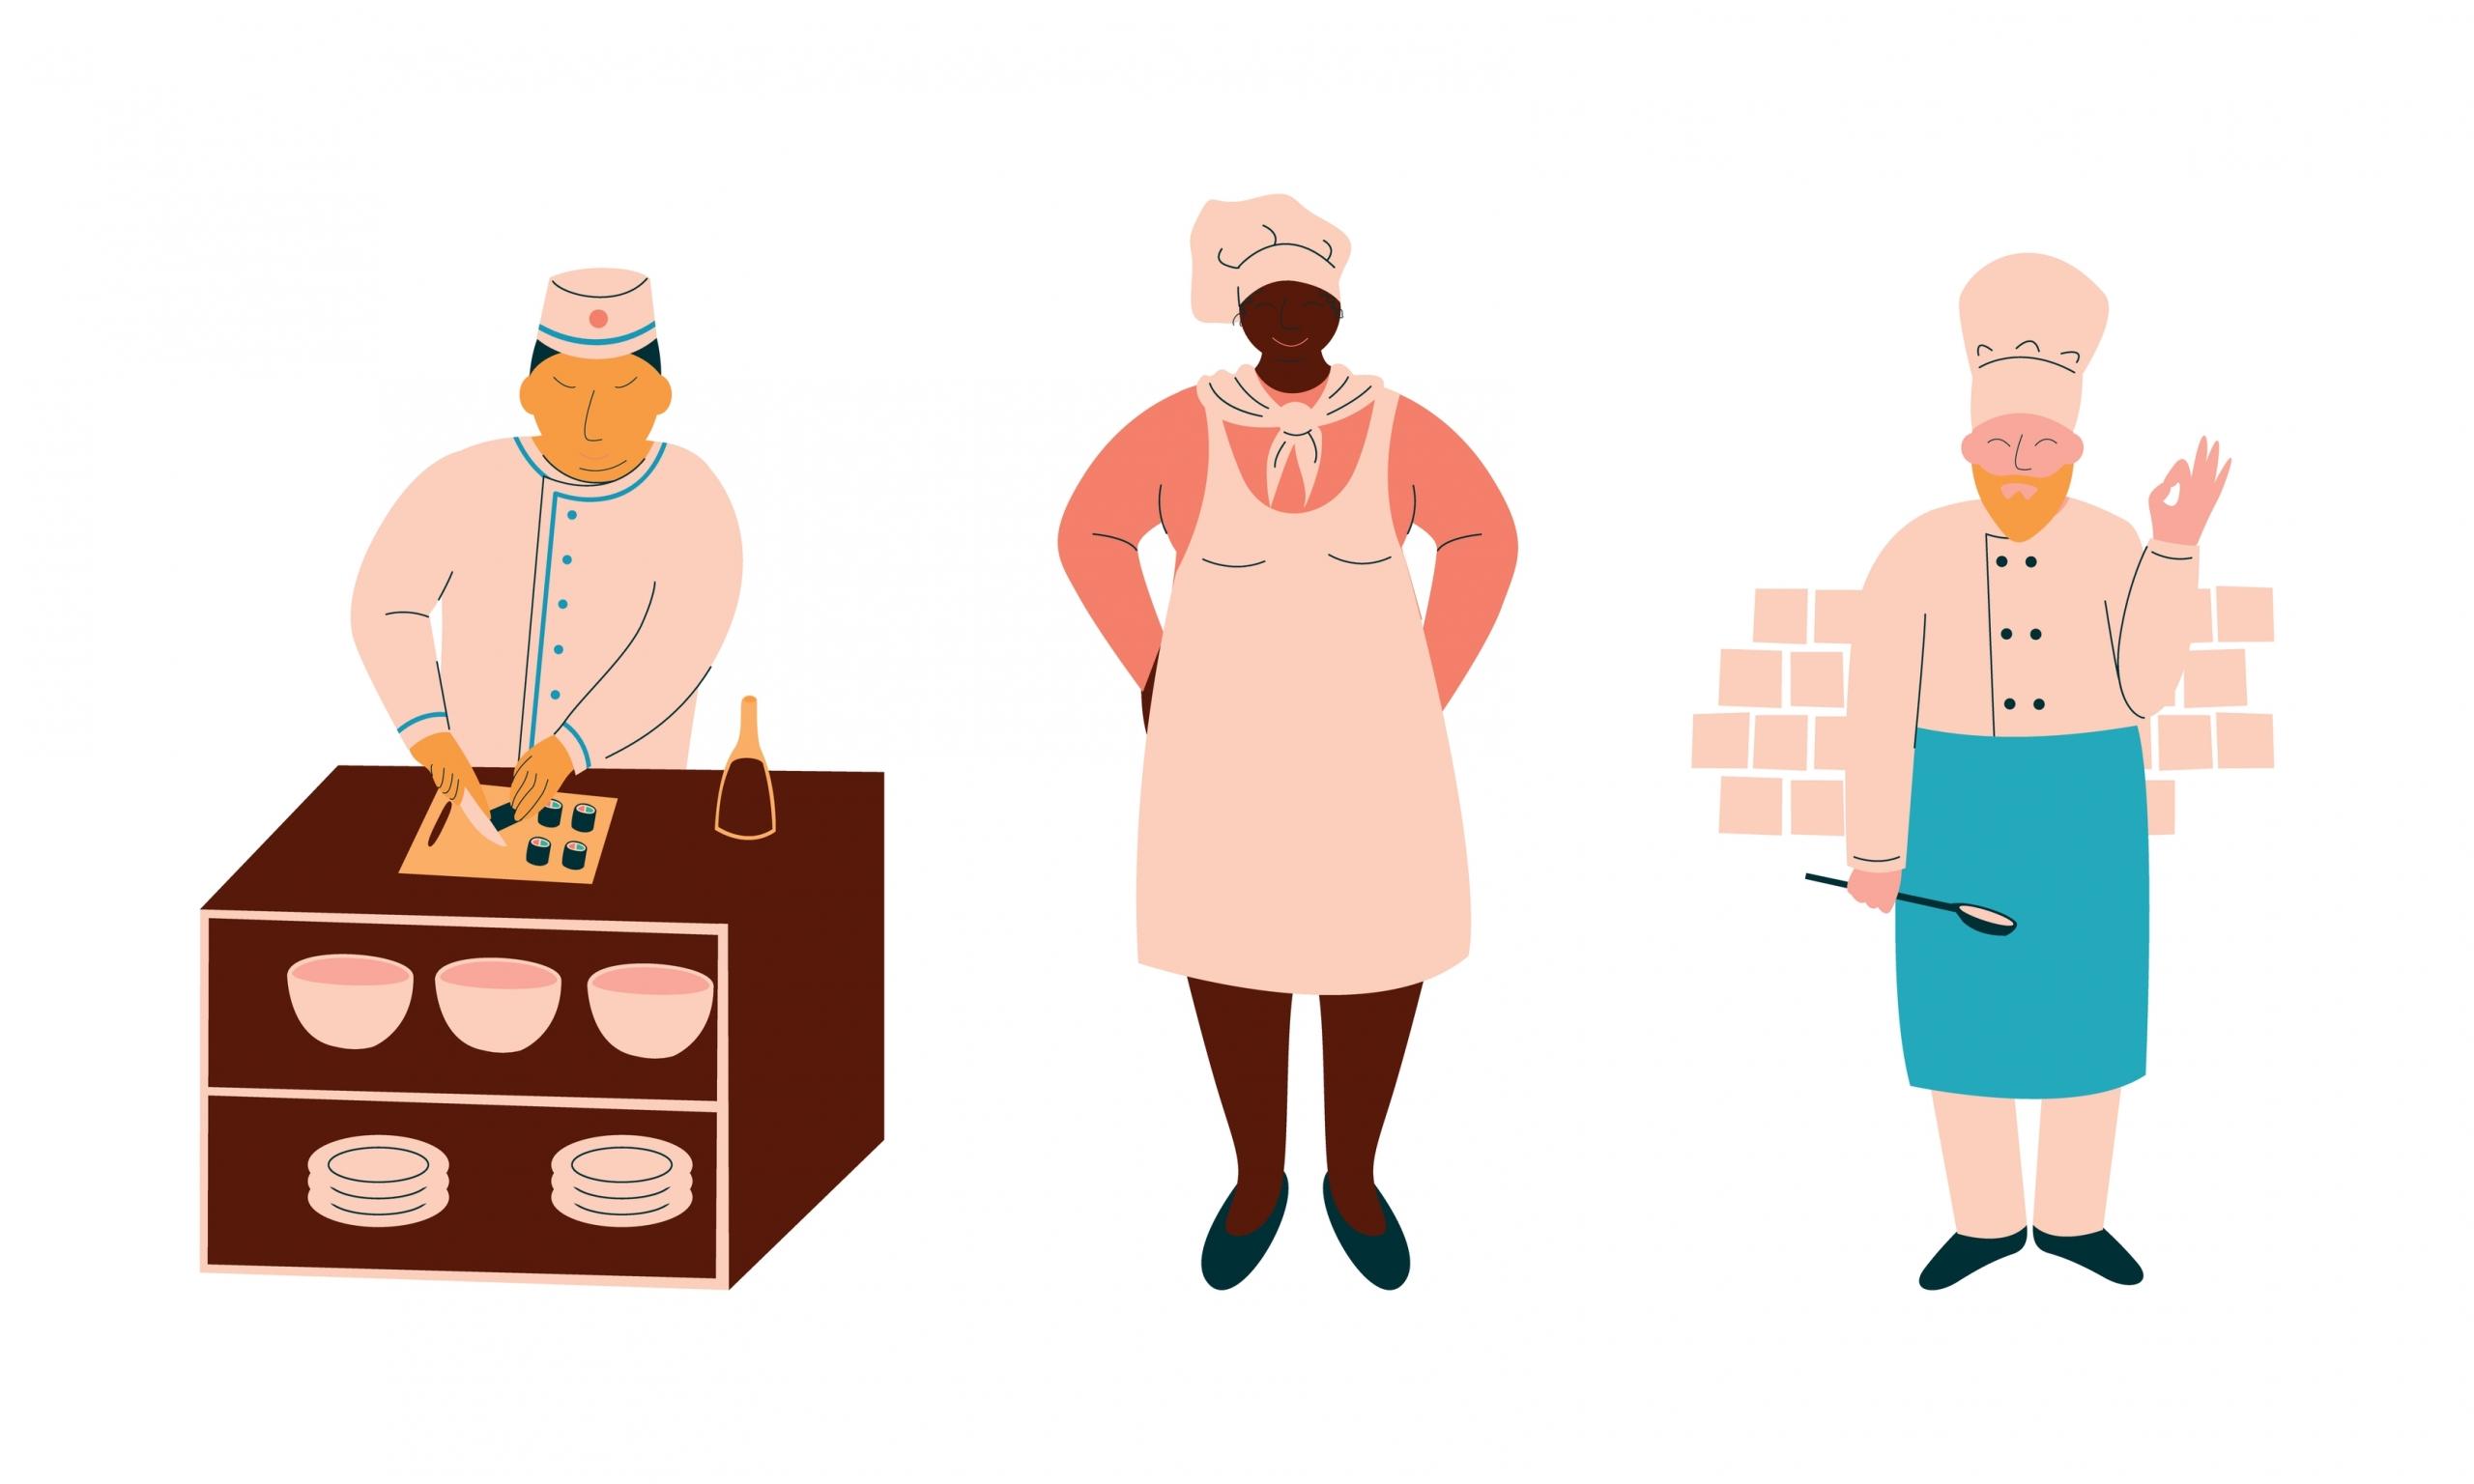 does linen quality matter in restaurants?